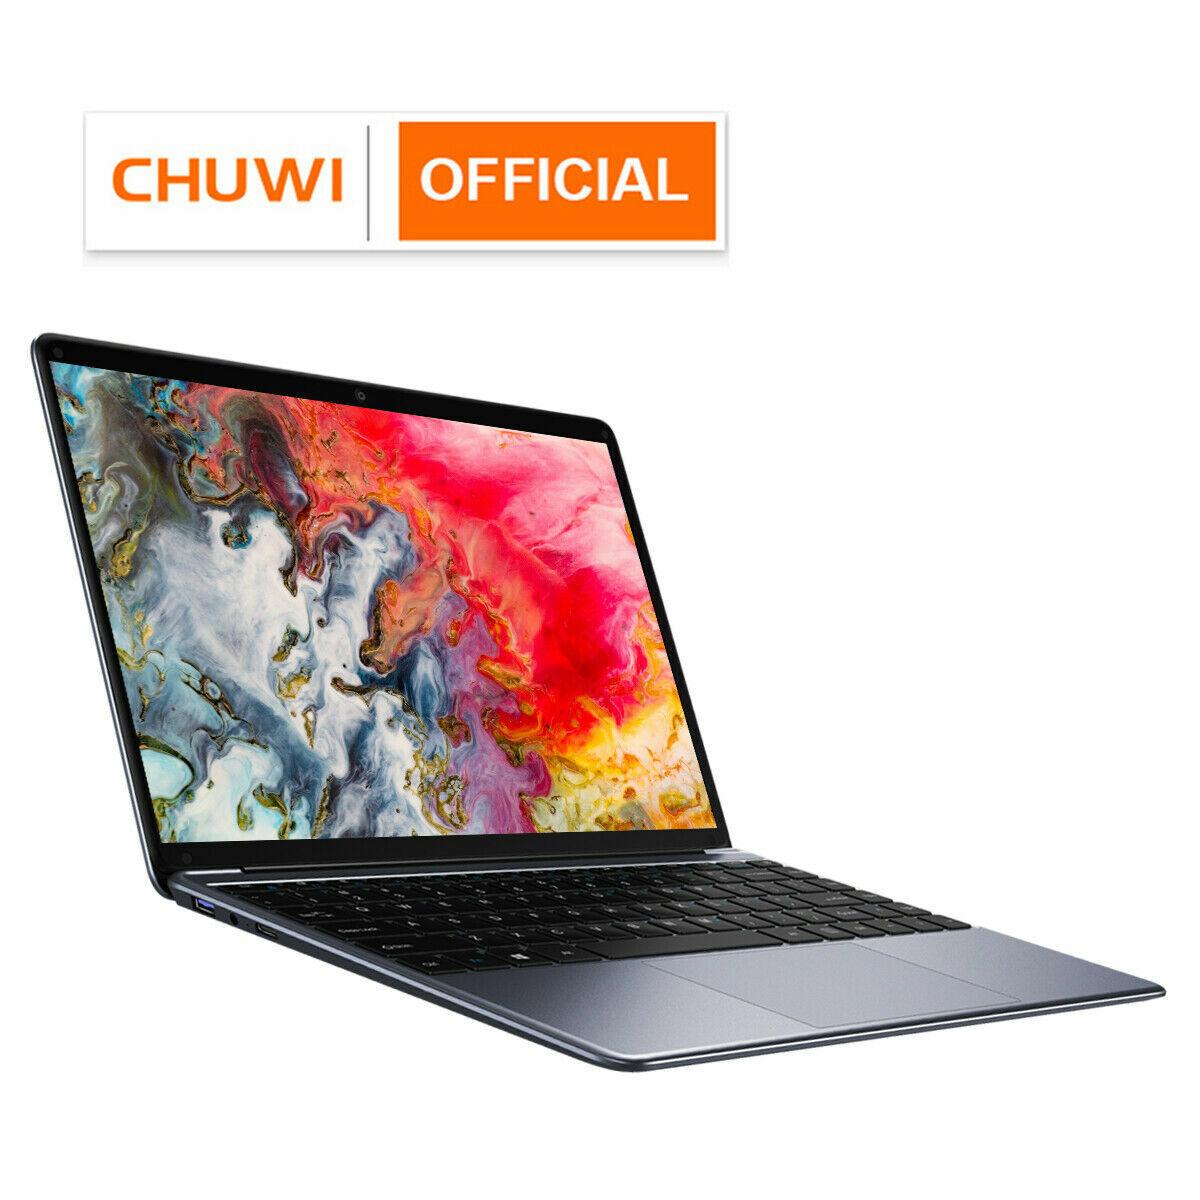 CHUWI HeroBook Pro 14.1 in Laptop Windows Intel N4000 8+256G